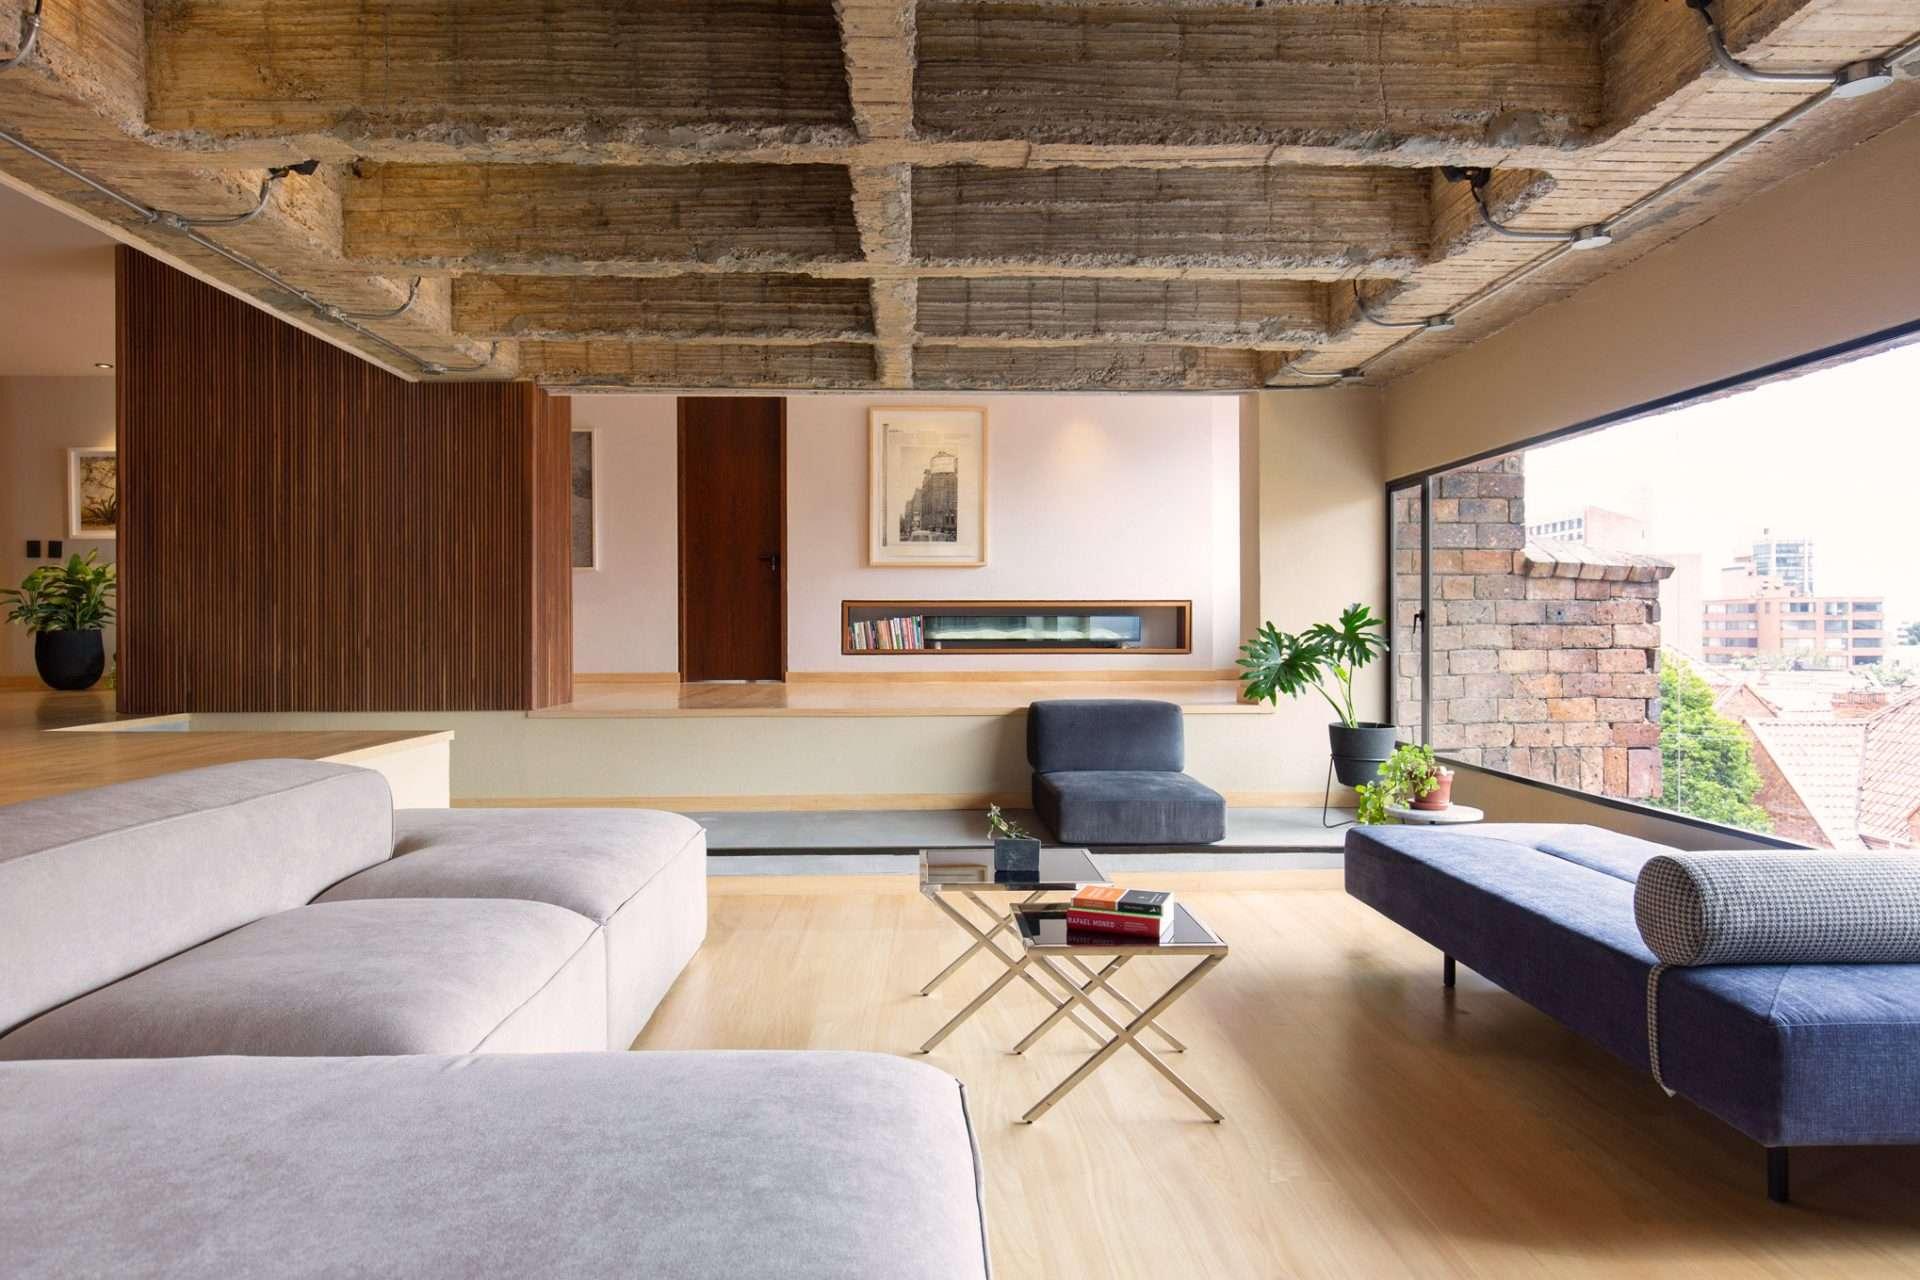 02.MLS_arquitectura_taller_tragaluz_interior_dutch_bogota_colombia_simon_bosch_photography